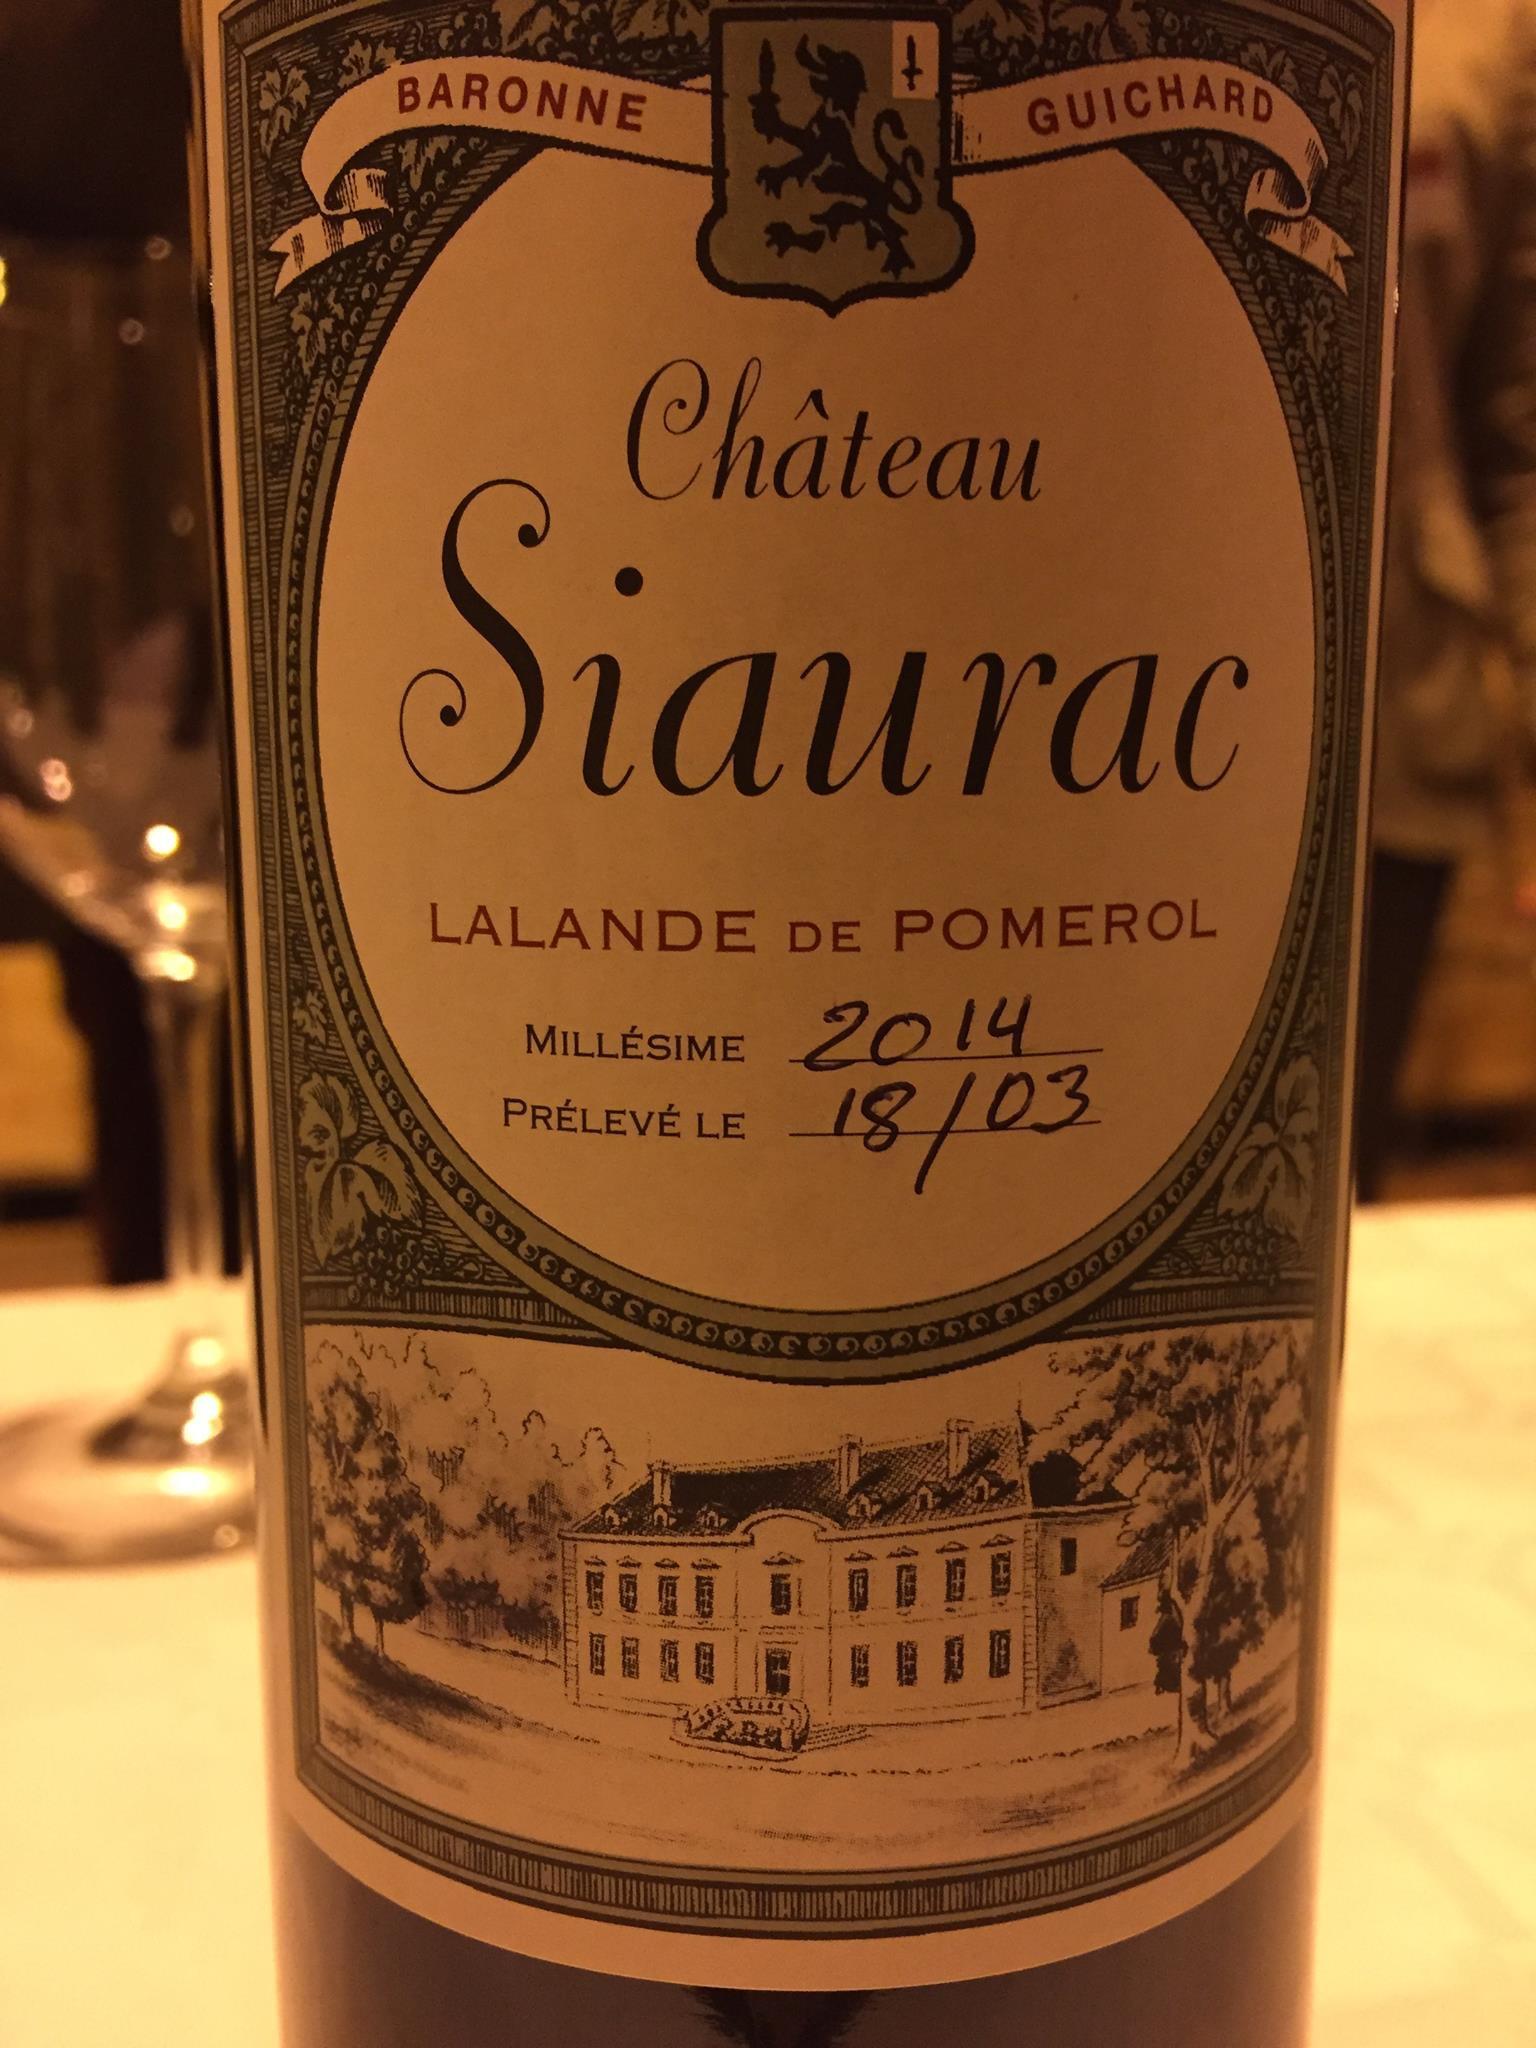 Château Siaurac 2014 – Lalande-de-Pomerol